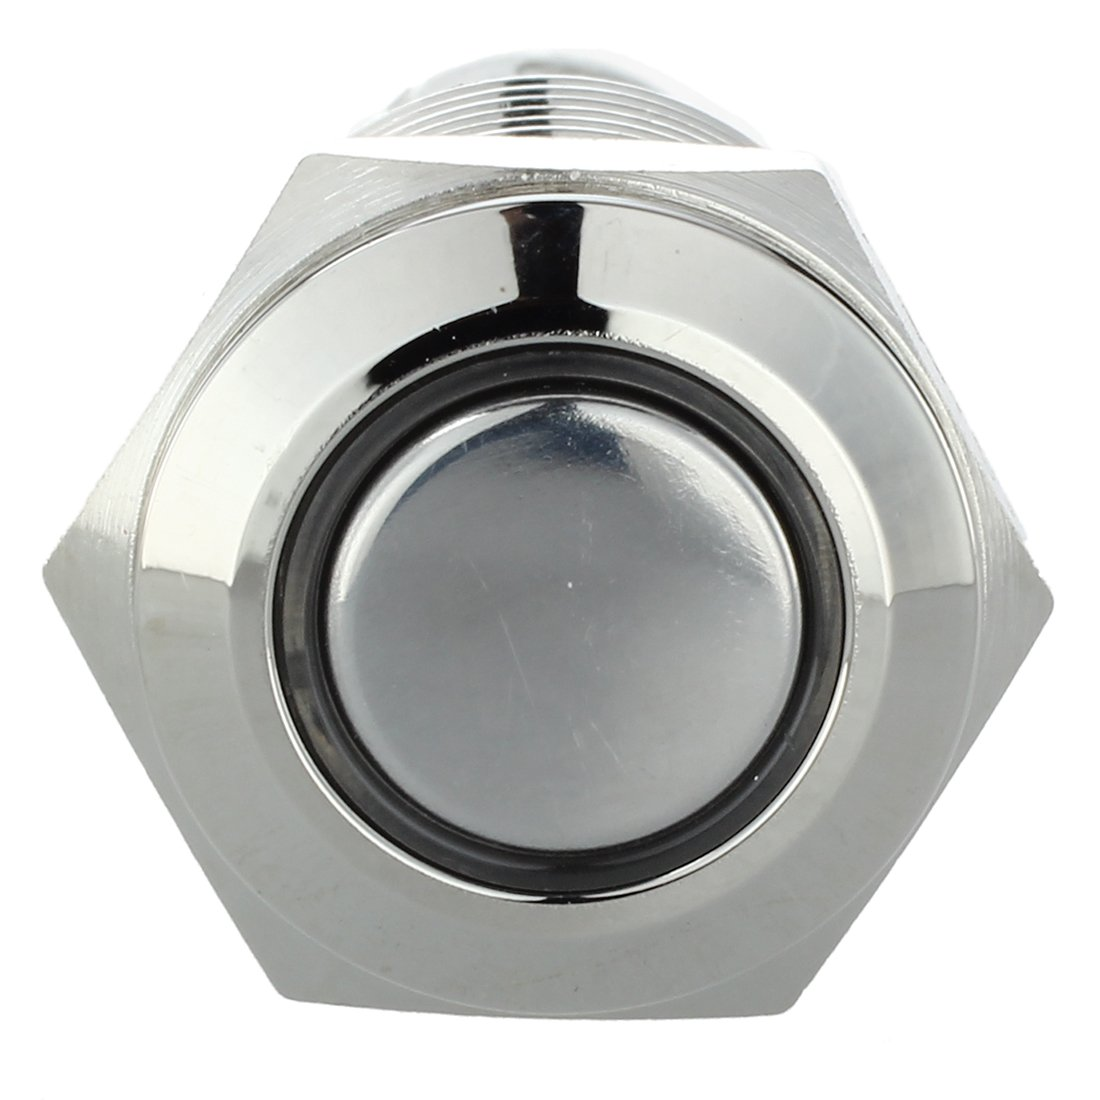 SODIAL 12V Druckschalter Drucktaster Schalter Vandalismusschalter Led 16mm Weiss Neu R